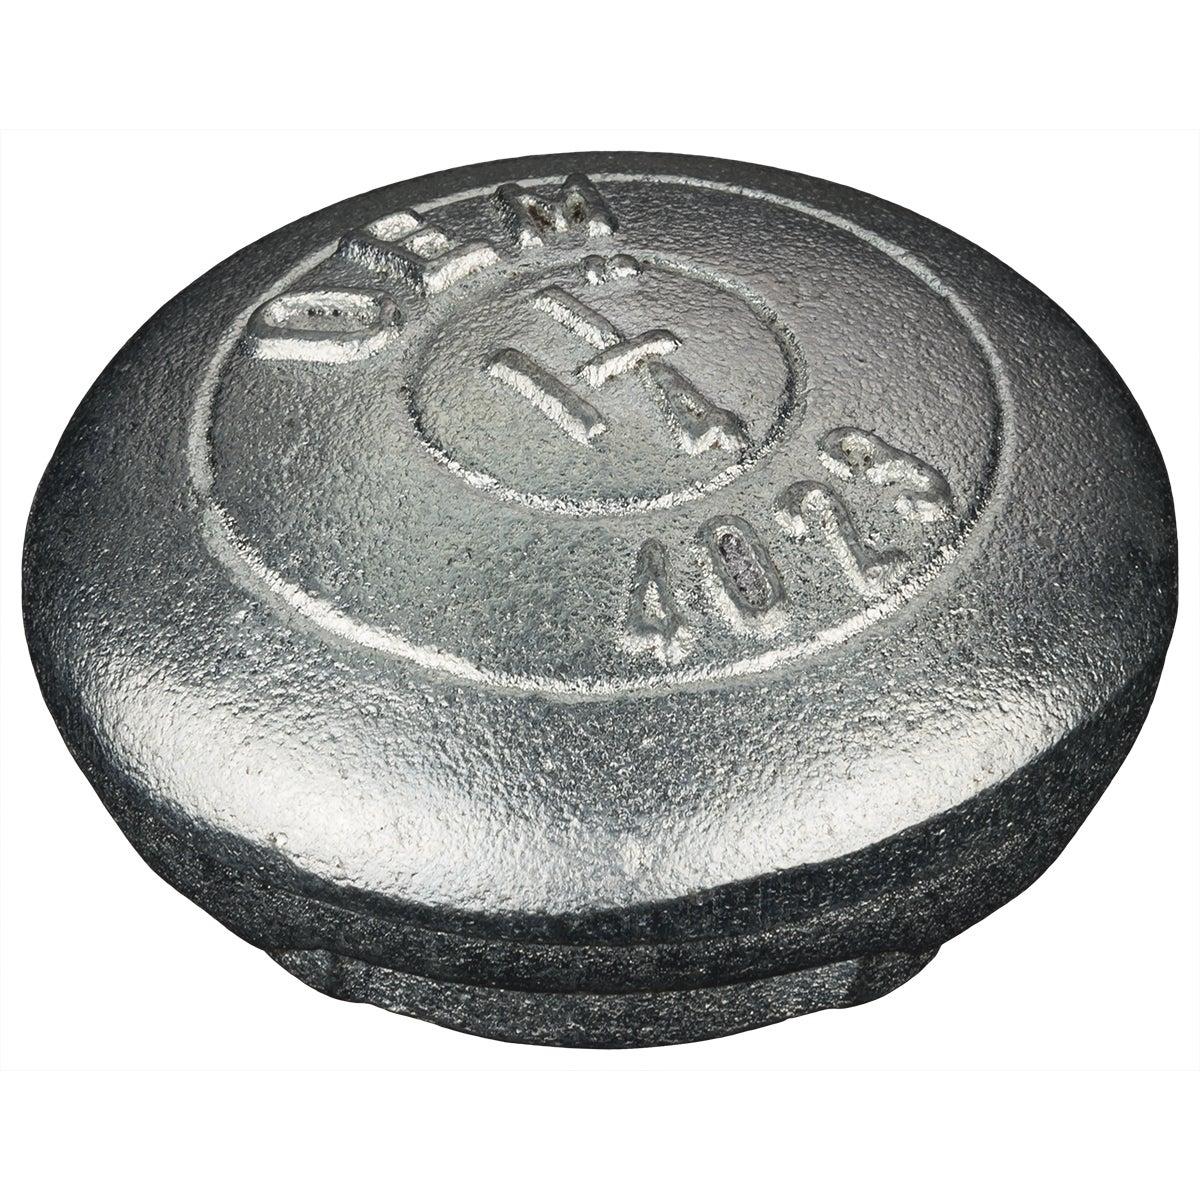 1-1/4 MSHRM TNK VENT CAP - DIB464147 by Rheem